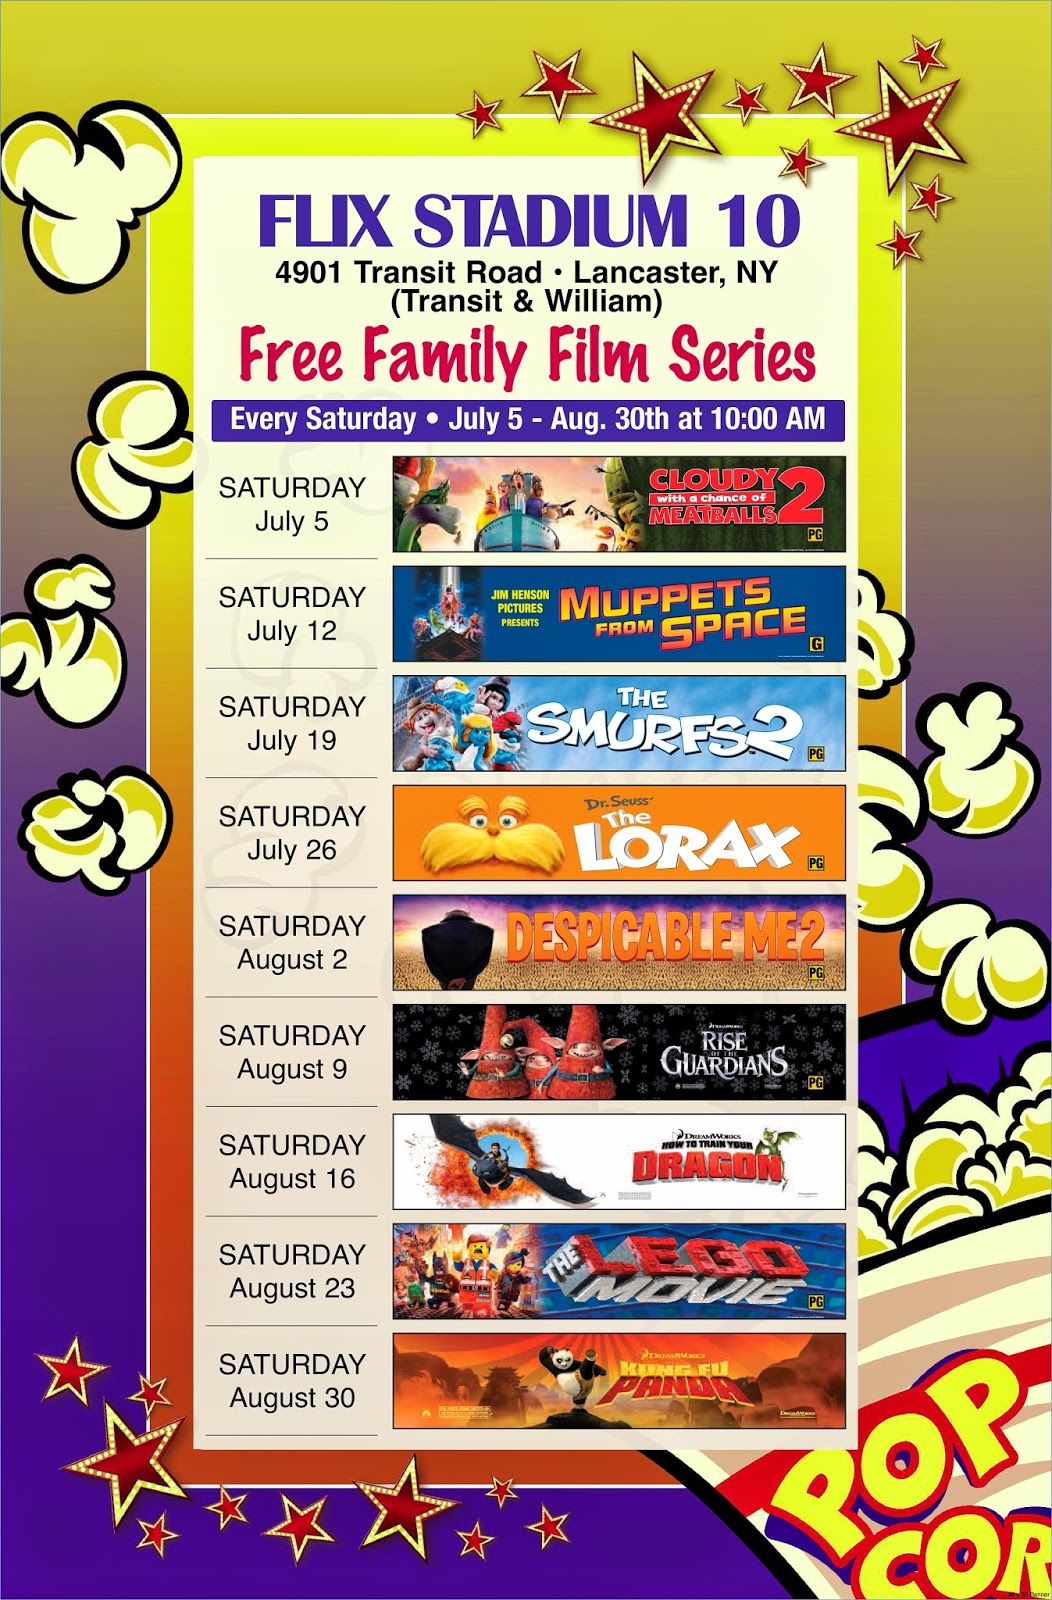 http://flix10.dipsontheatres.com/?p=content&id=Free+Family+Film+Series